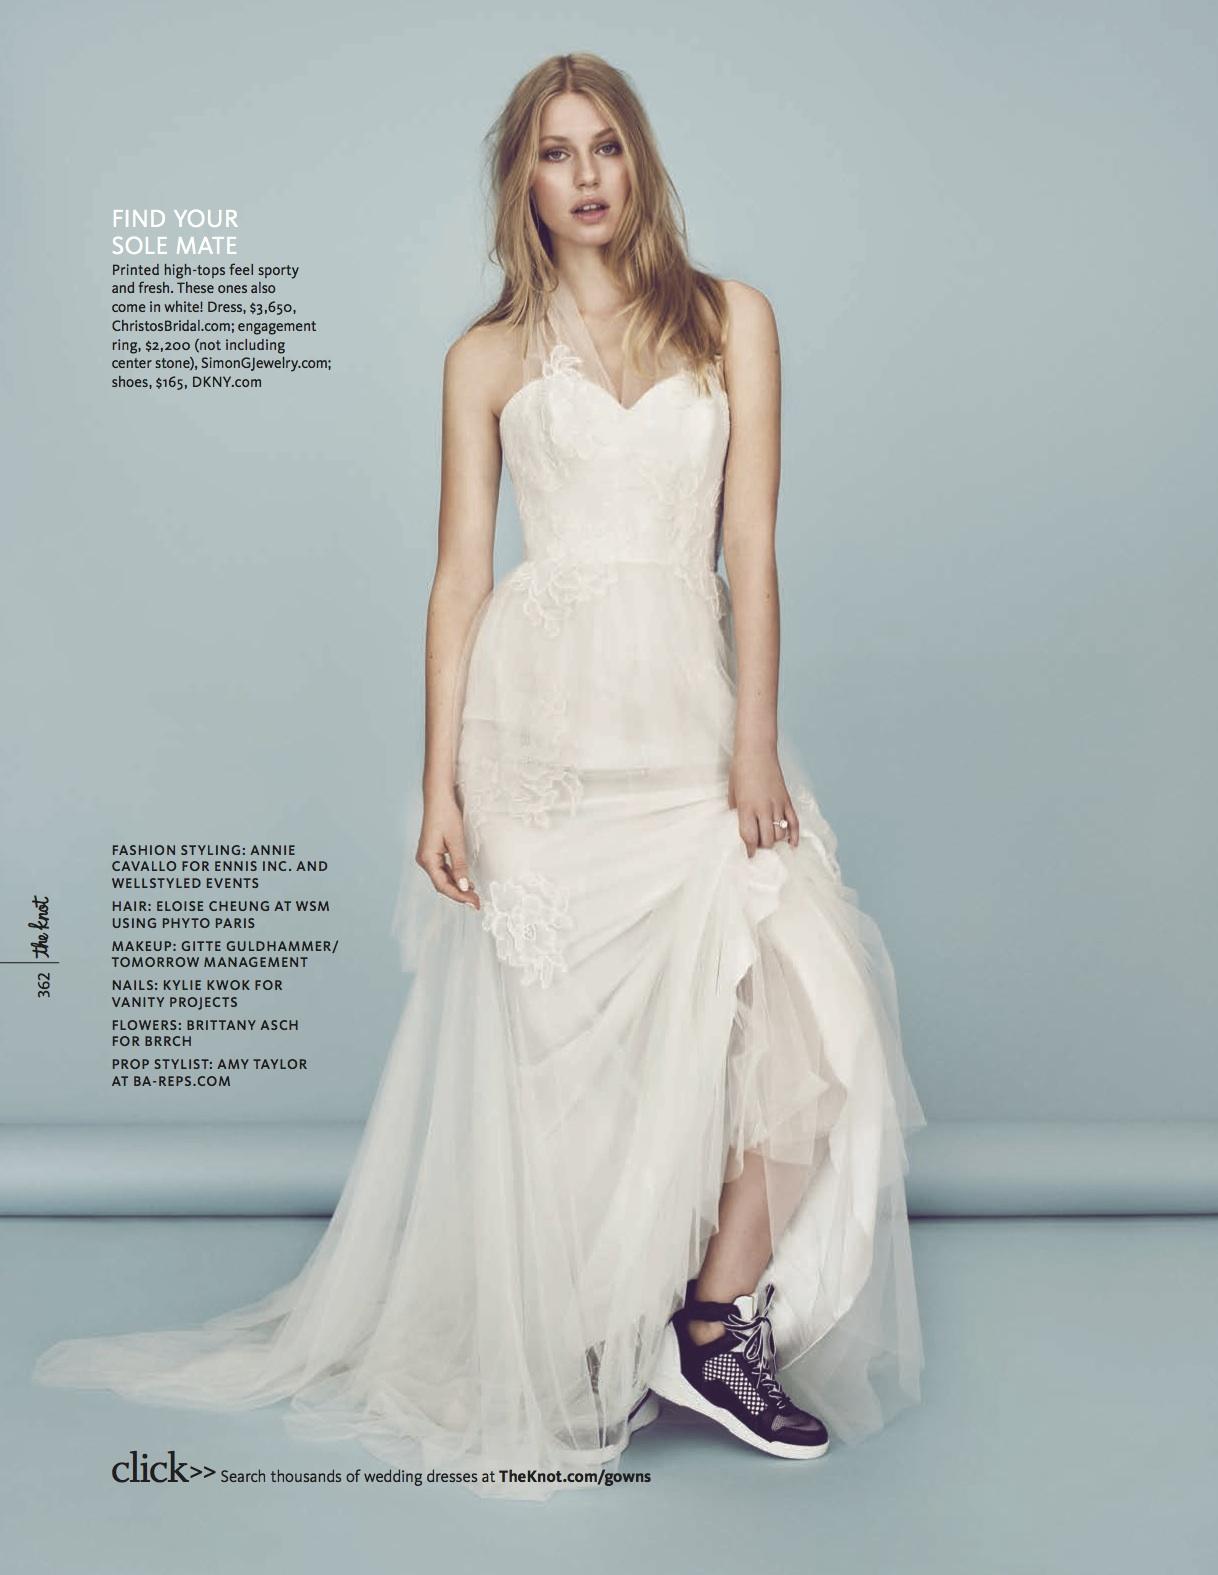 Exelent Joanna Krupa Wedding Dress Gift - All Wedding Dresses ...